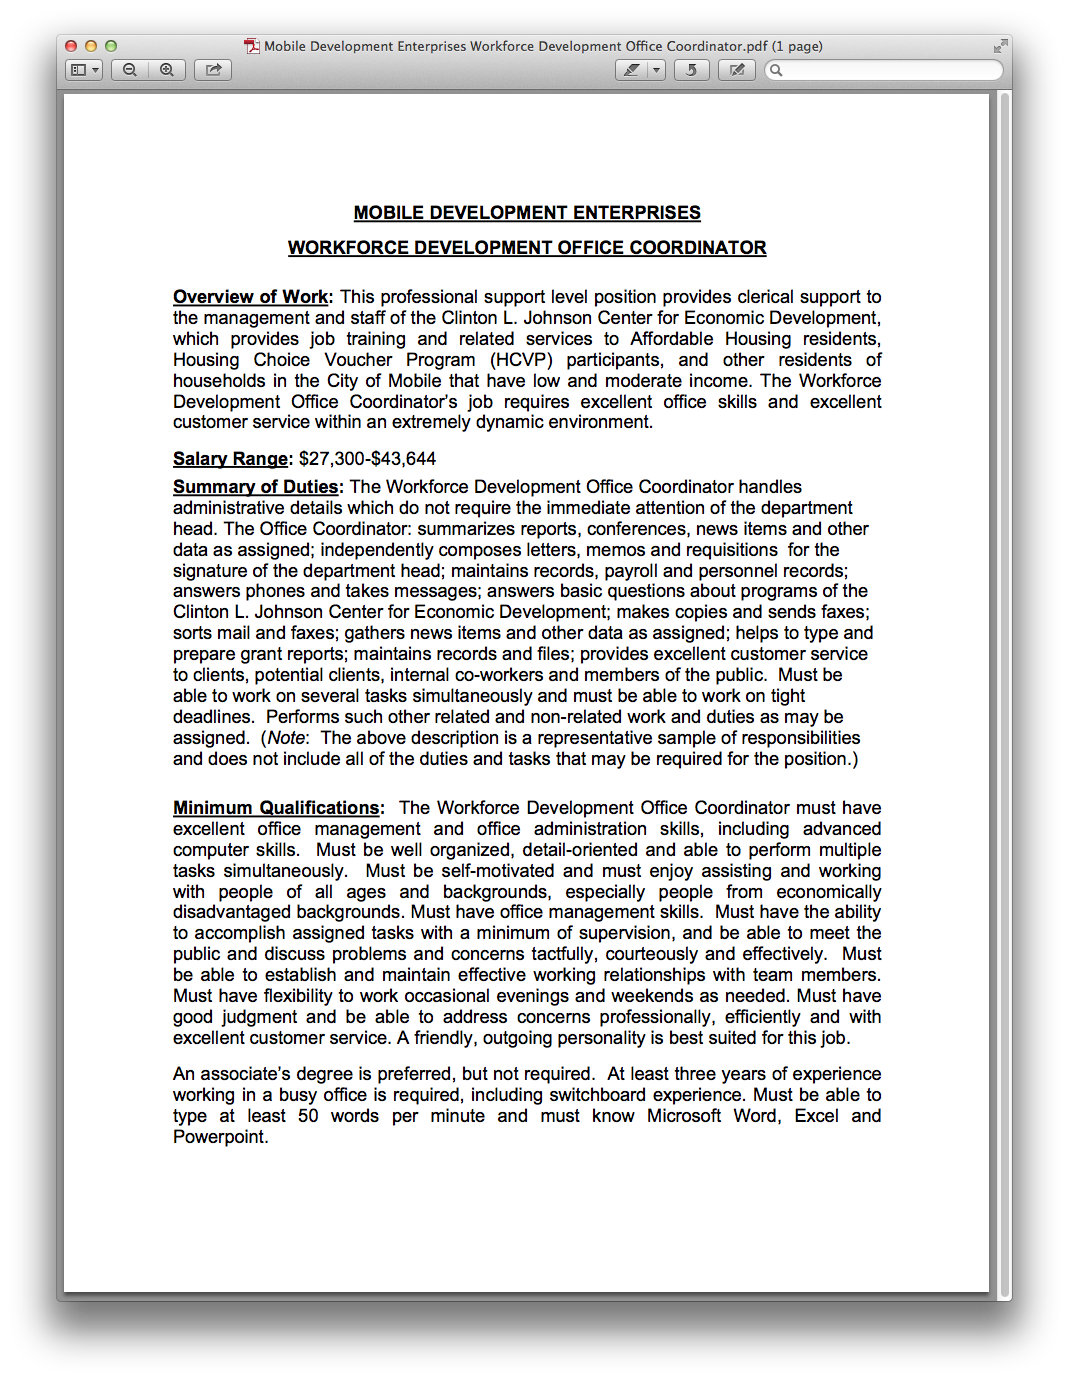 Mobile Development Enterprises Workforce Development